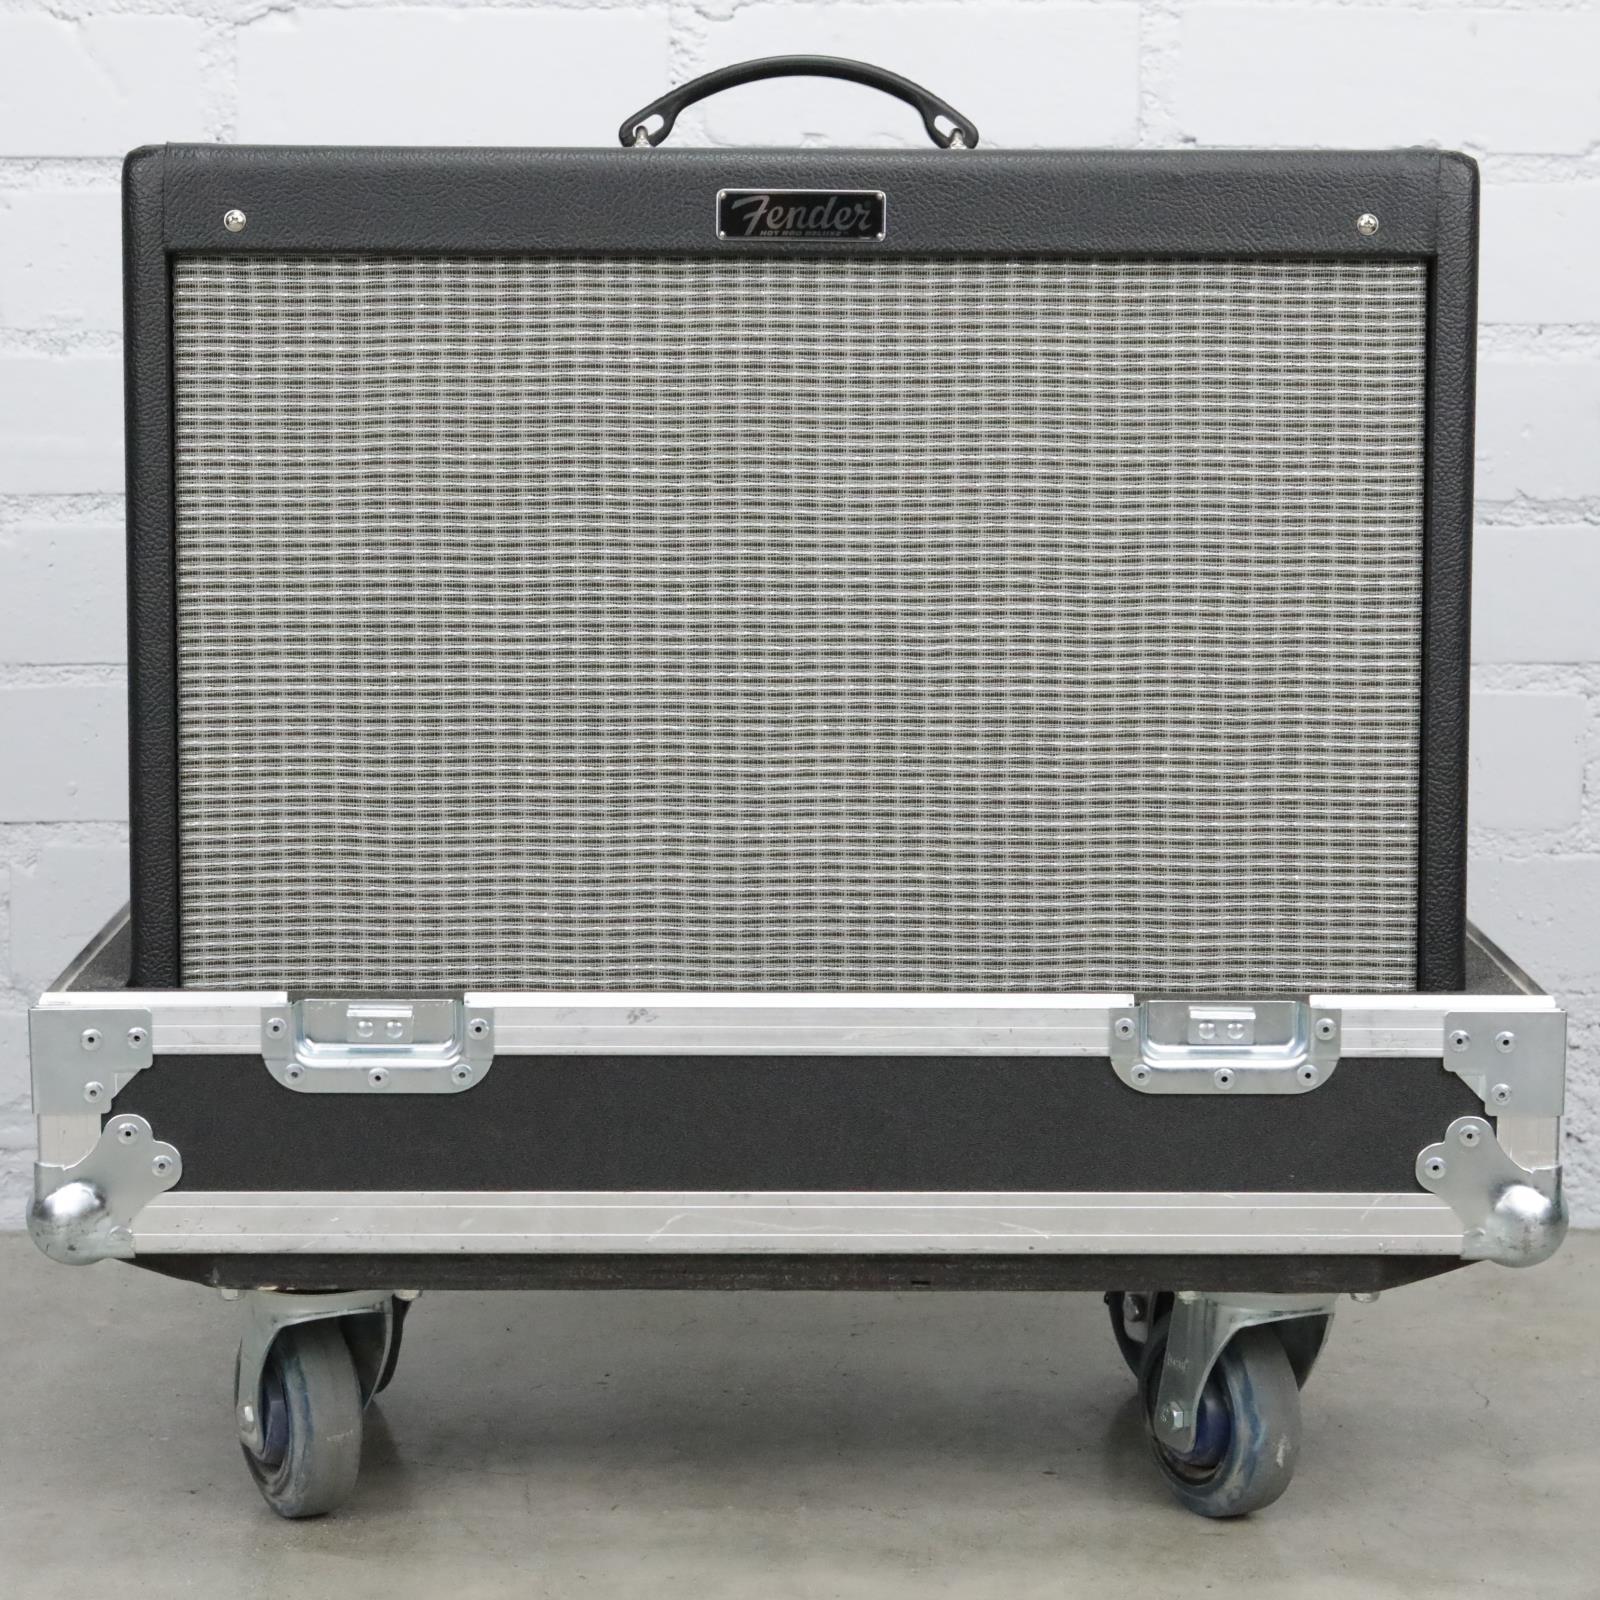 Fender Hot Rod Deluxe III Tube Guitar Combo Amplifier w/ Road Case #40761